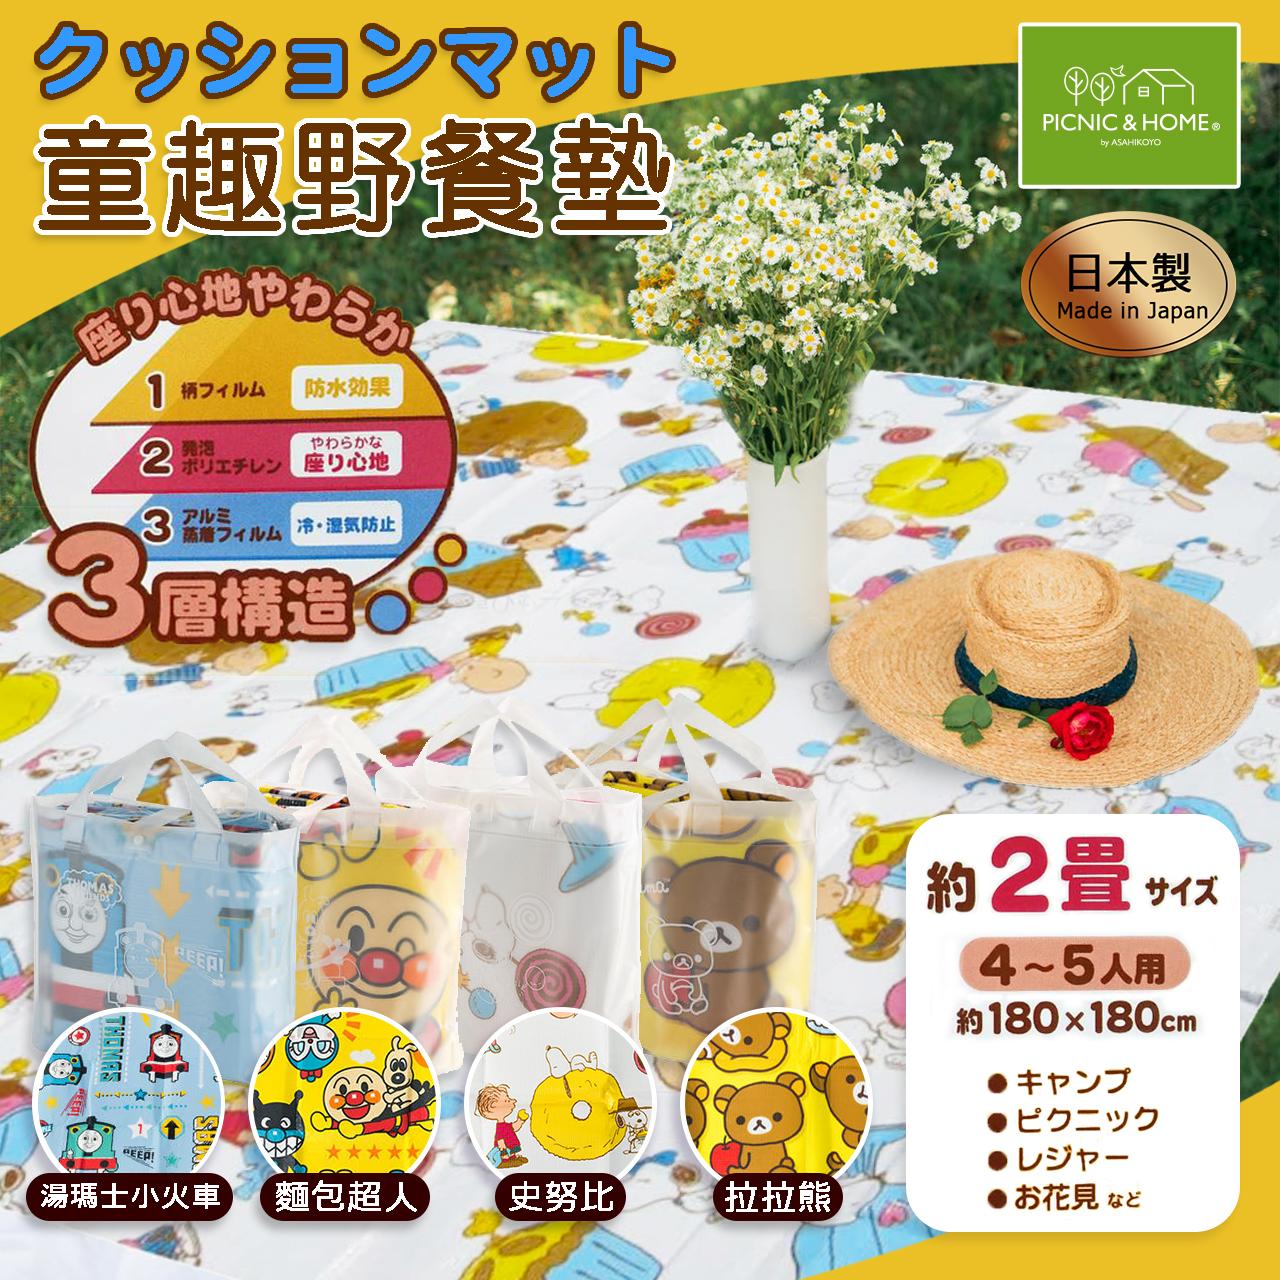 《HOYA-Life日本生活館》日本製 戶外 露營 野餐 休閒 賞花 卡通 童趣 野餐墊 (附手提袋)